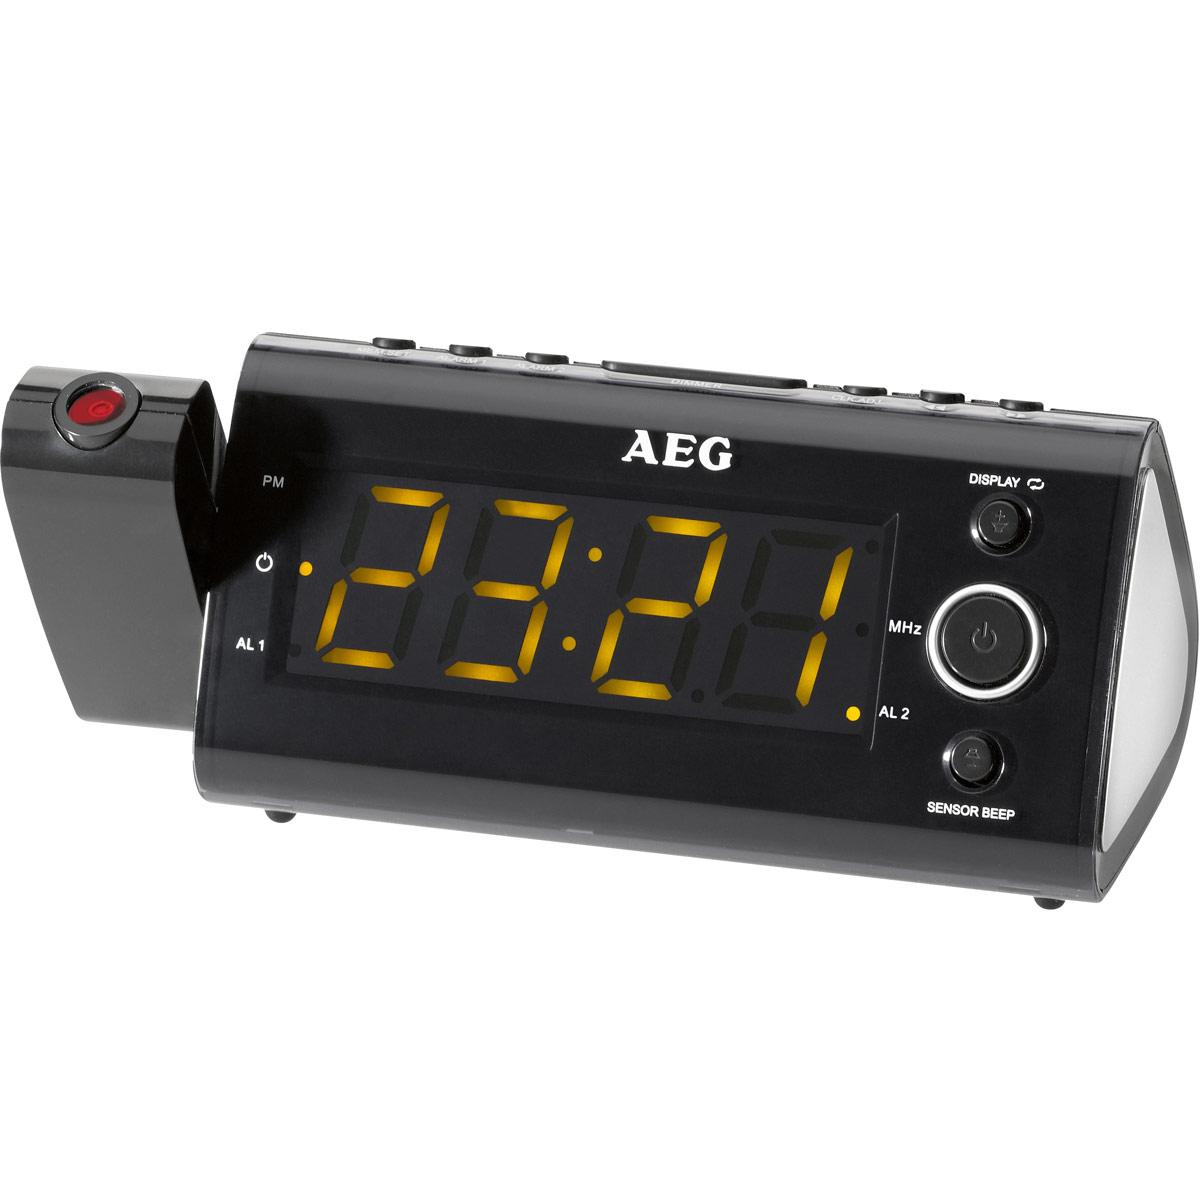 Радио-будильник AEG MRC 4121 P Sensor, Black радиочасы aeg mrc 4145 f white